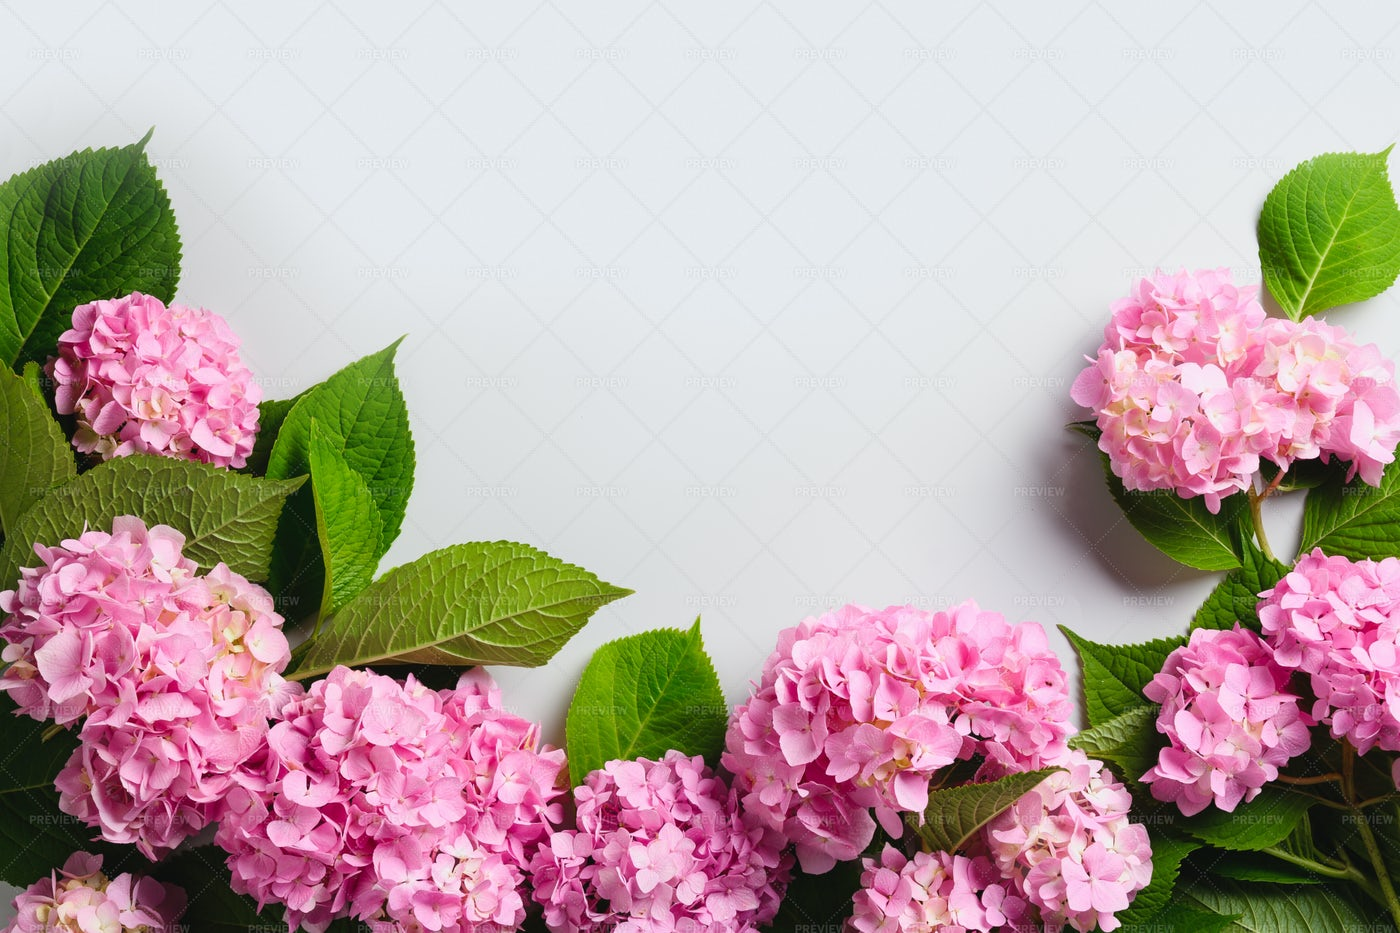 Border Of Fresh Pink Hydrangea Flowers: Stock Photos